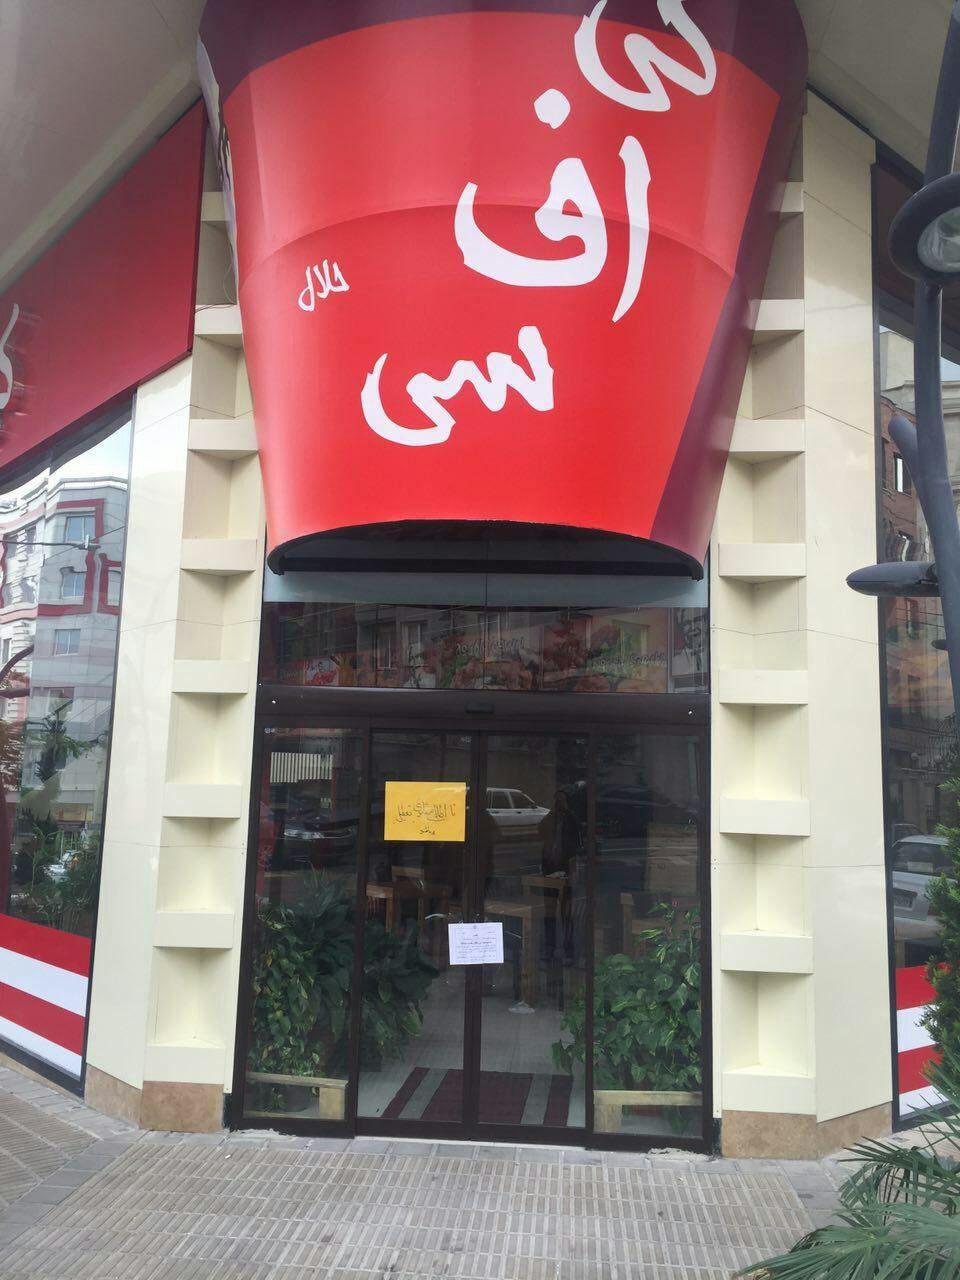 KFC فست فود آمریکایی، نیامده در تهران پلمپ شد/عکس